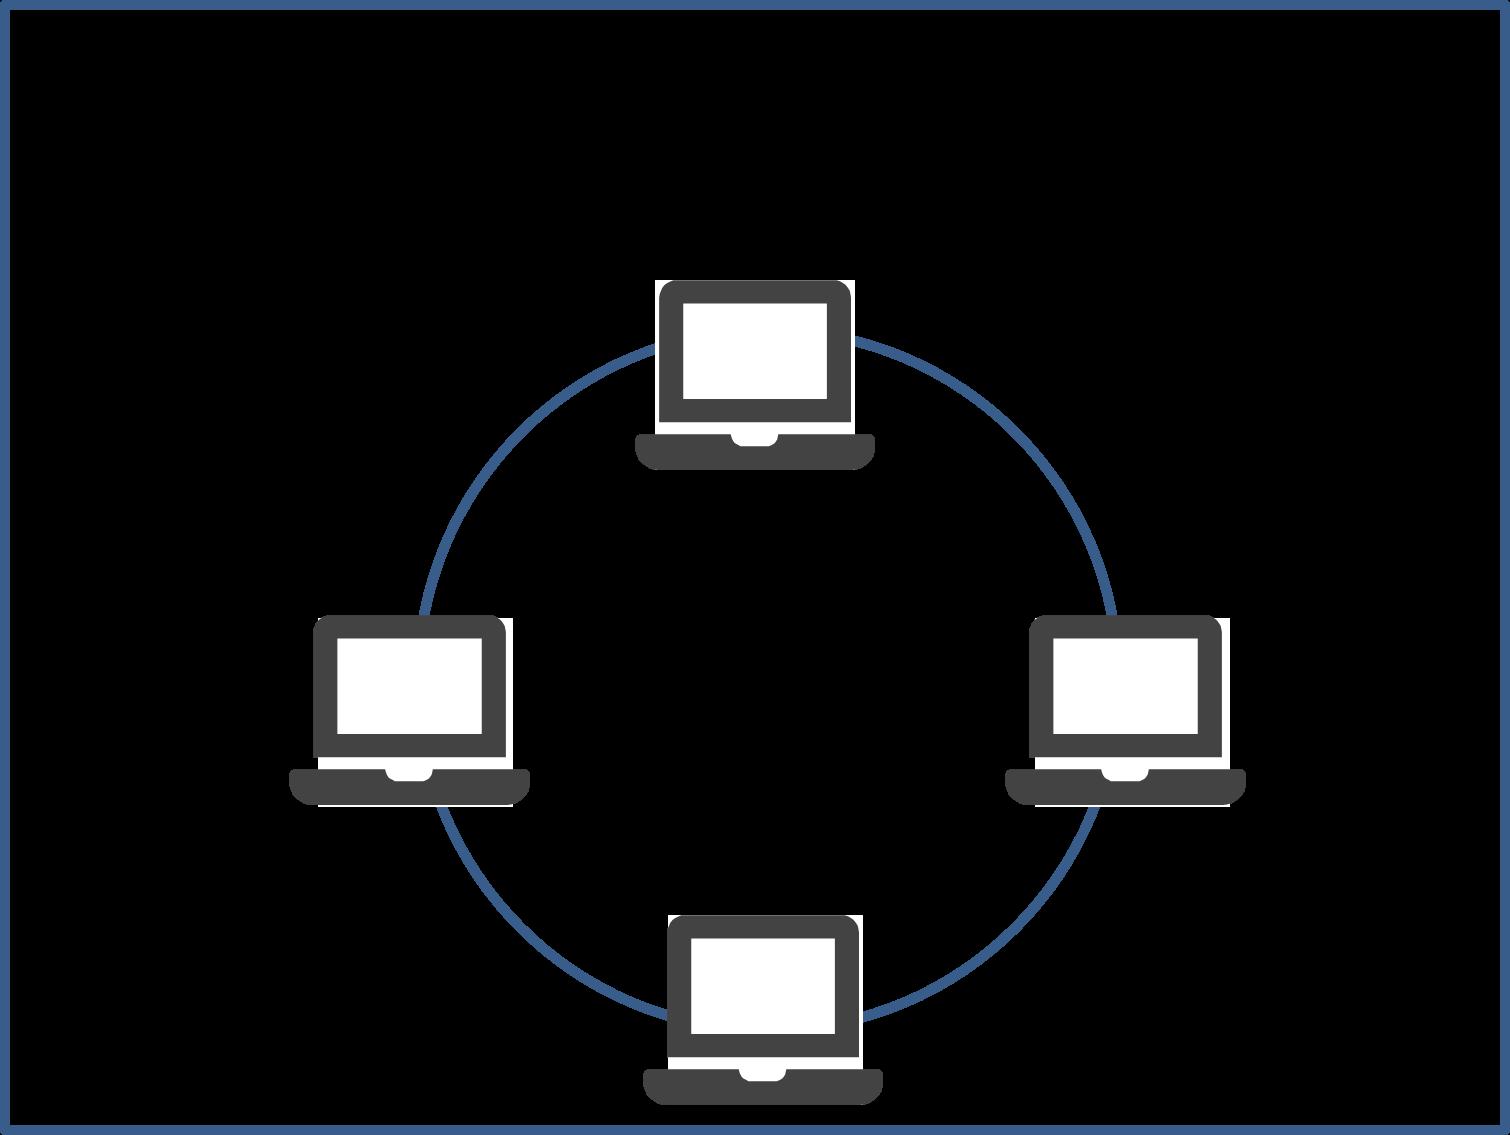 topologi ring sahretech